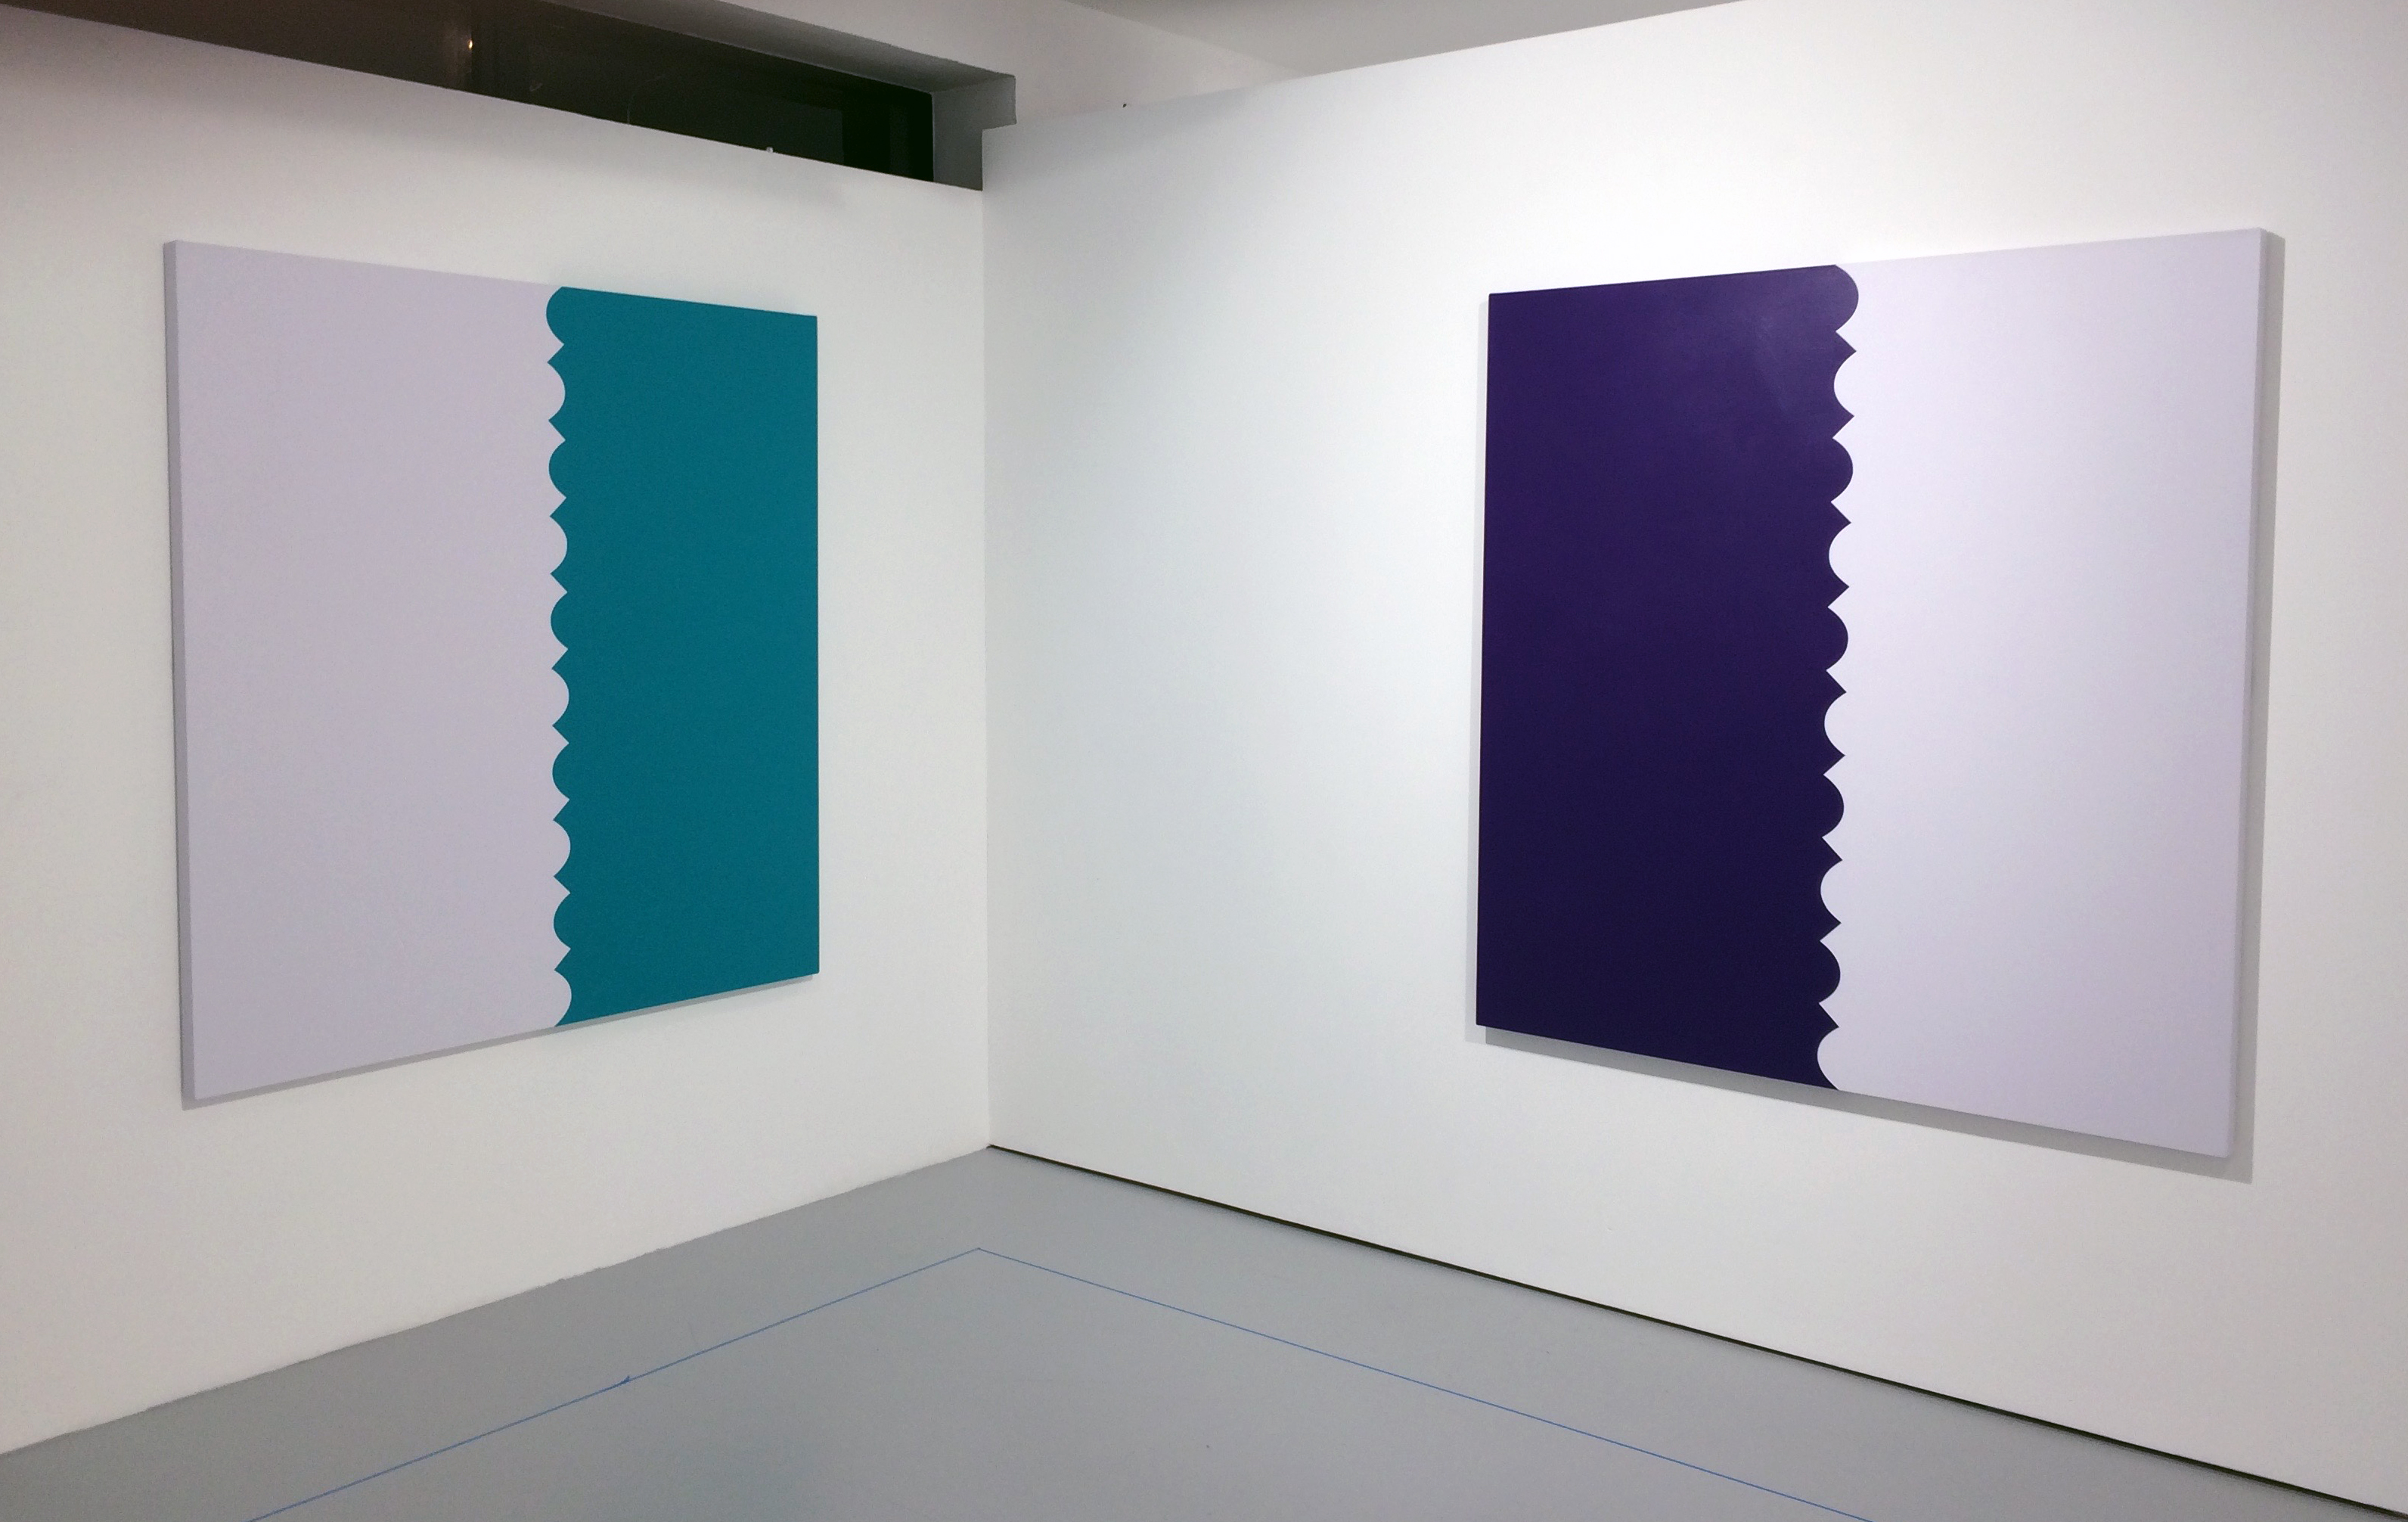 004 - HPX2pt1 - Tess Jaray - One Hundred Years [Green] & [Purple].jpg